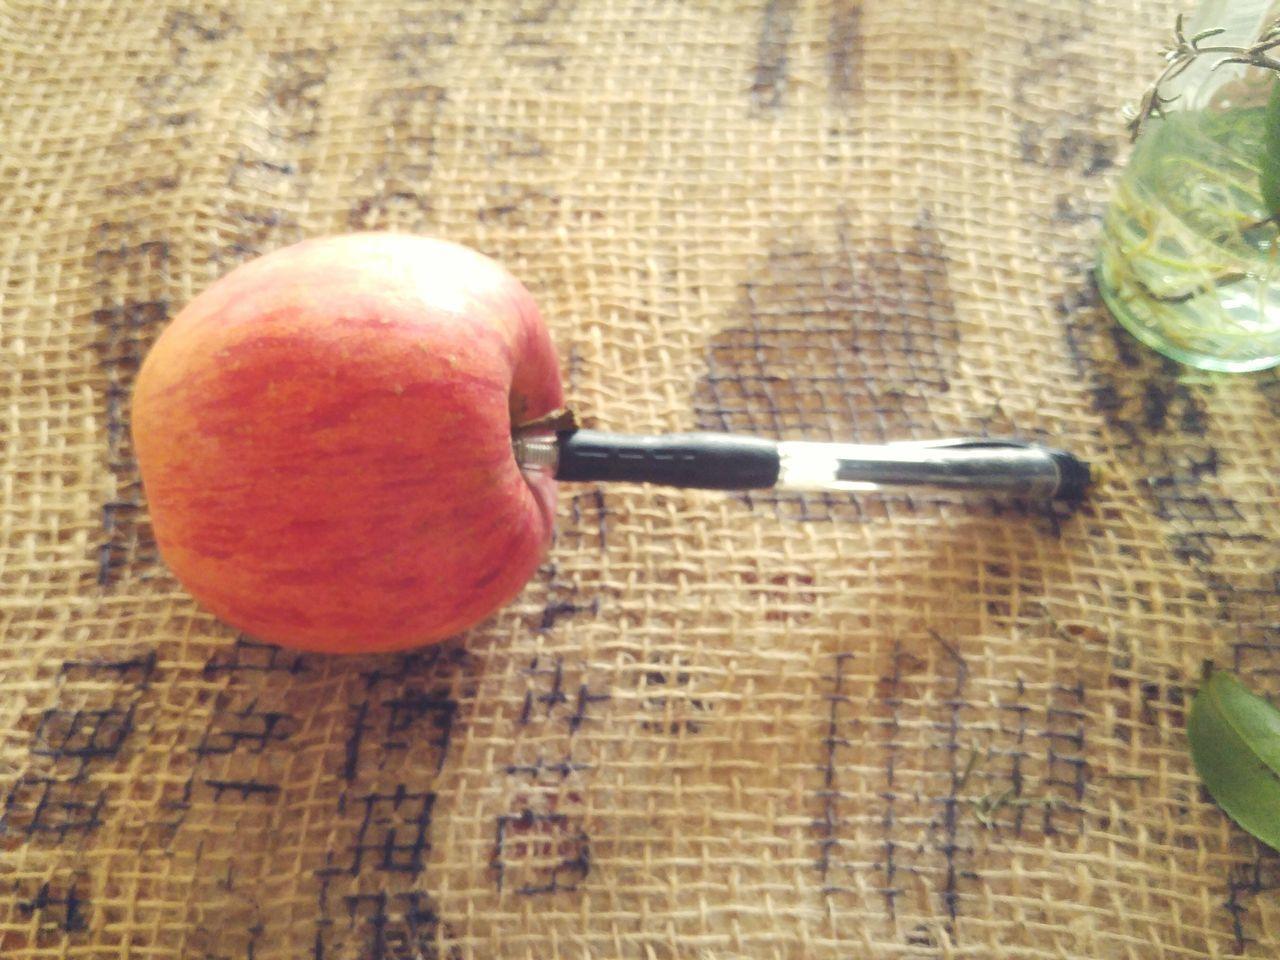 Apple―pen😁😁Table Wood - Material Close-up No People Food Healthy Eating Indoors  Day EyeEm Gallery EyeEm Nature Lover The Week On Eyem 林檎 Ringo Apple